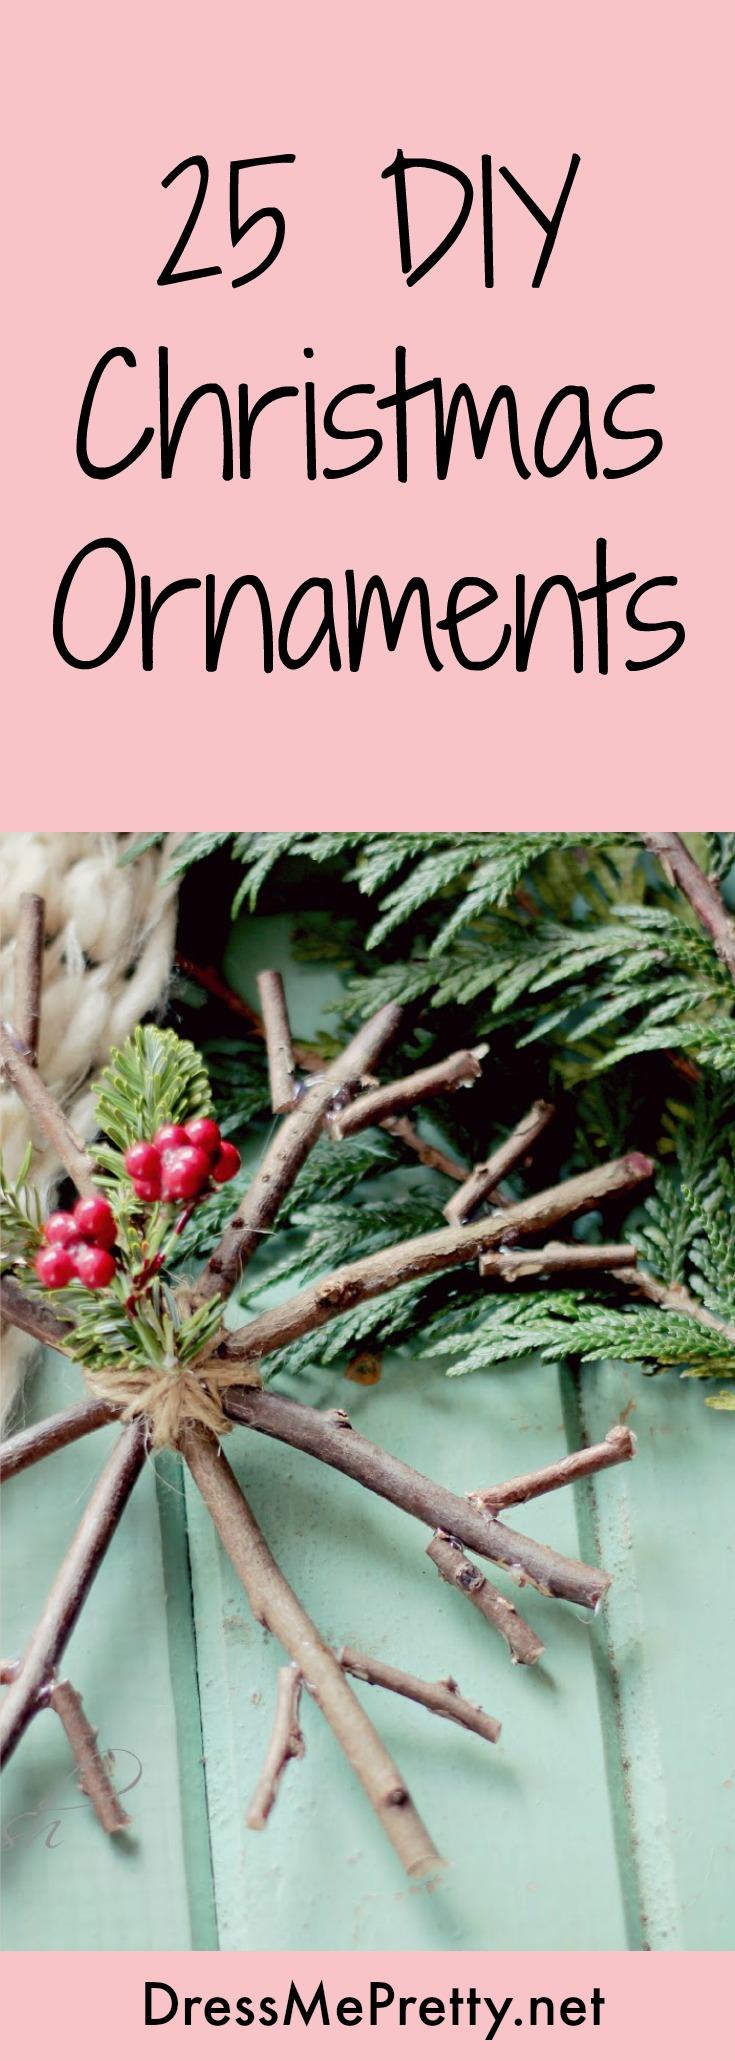 Ornaments DIY Christmas